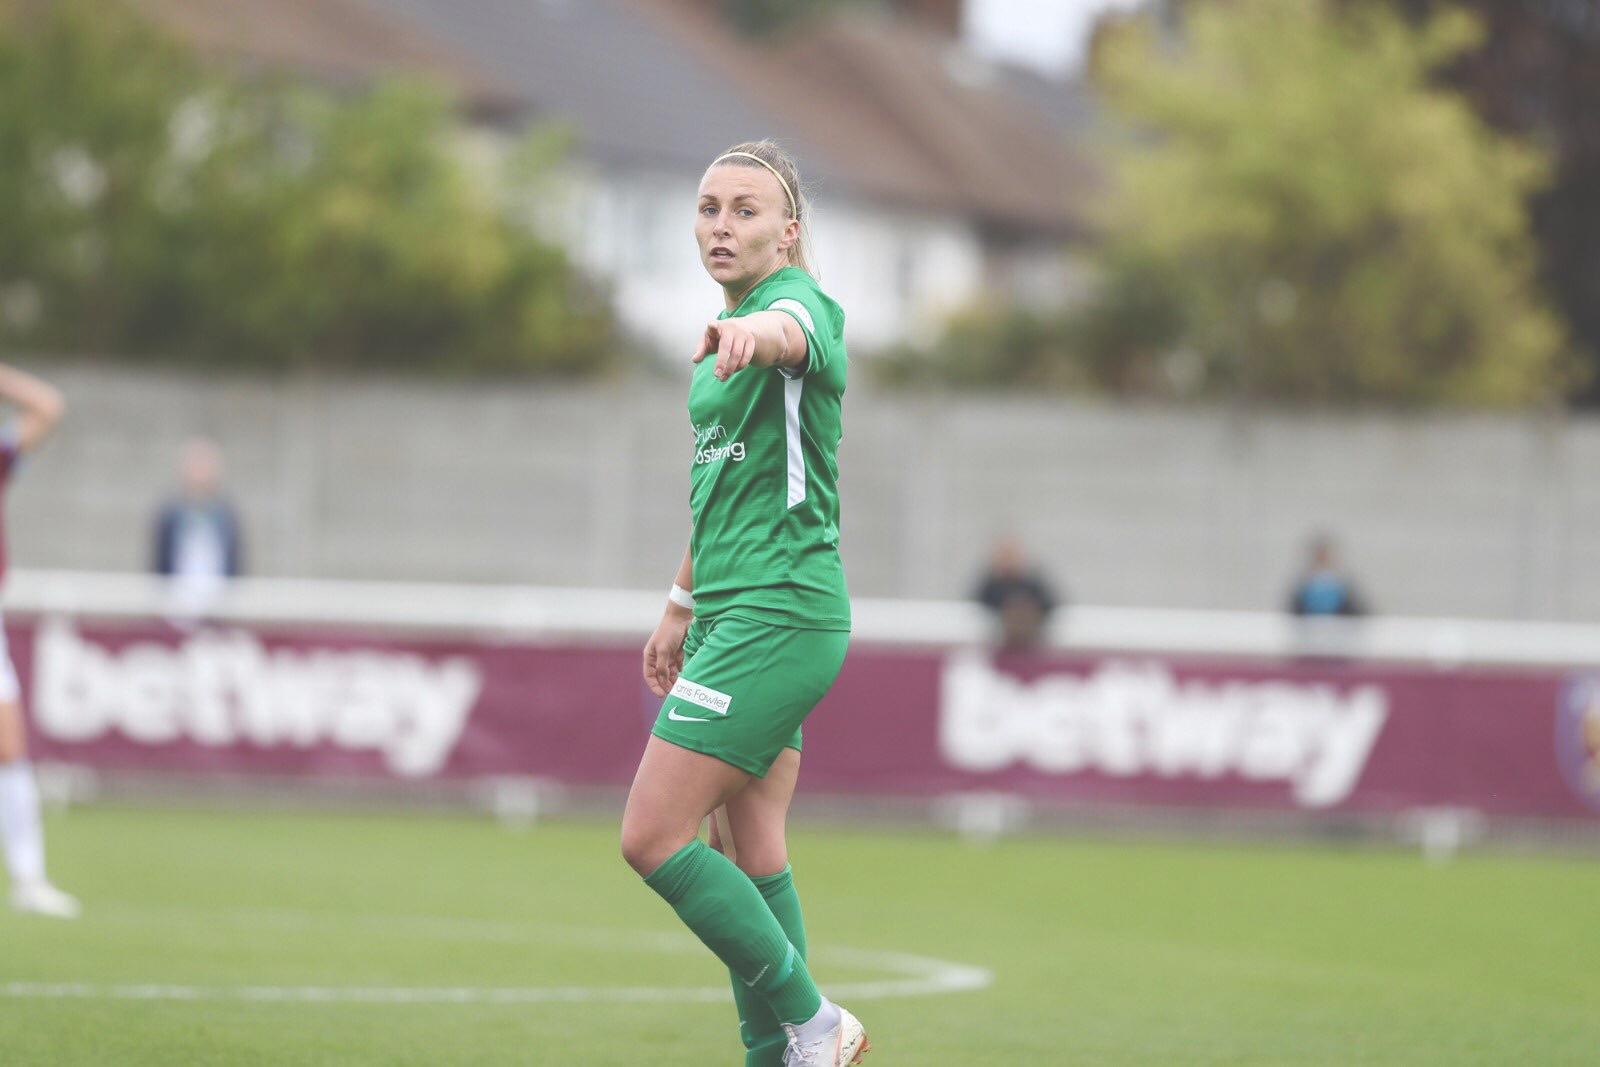 Hannah Short marshalling her Yeovil Town side. Photo from @YeovilLadiesFC